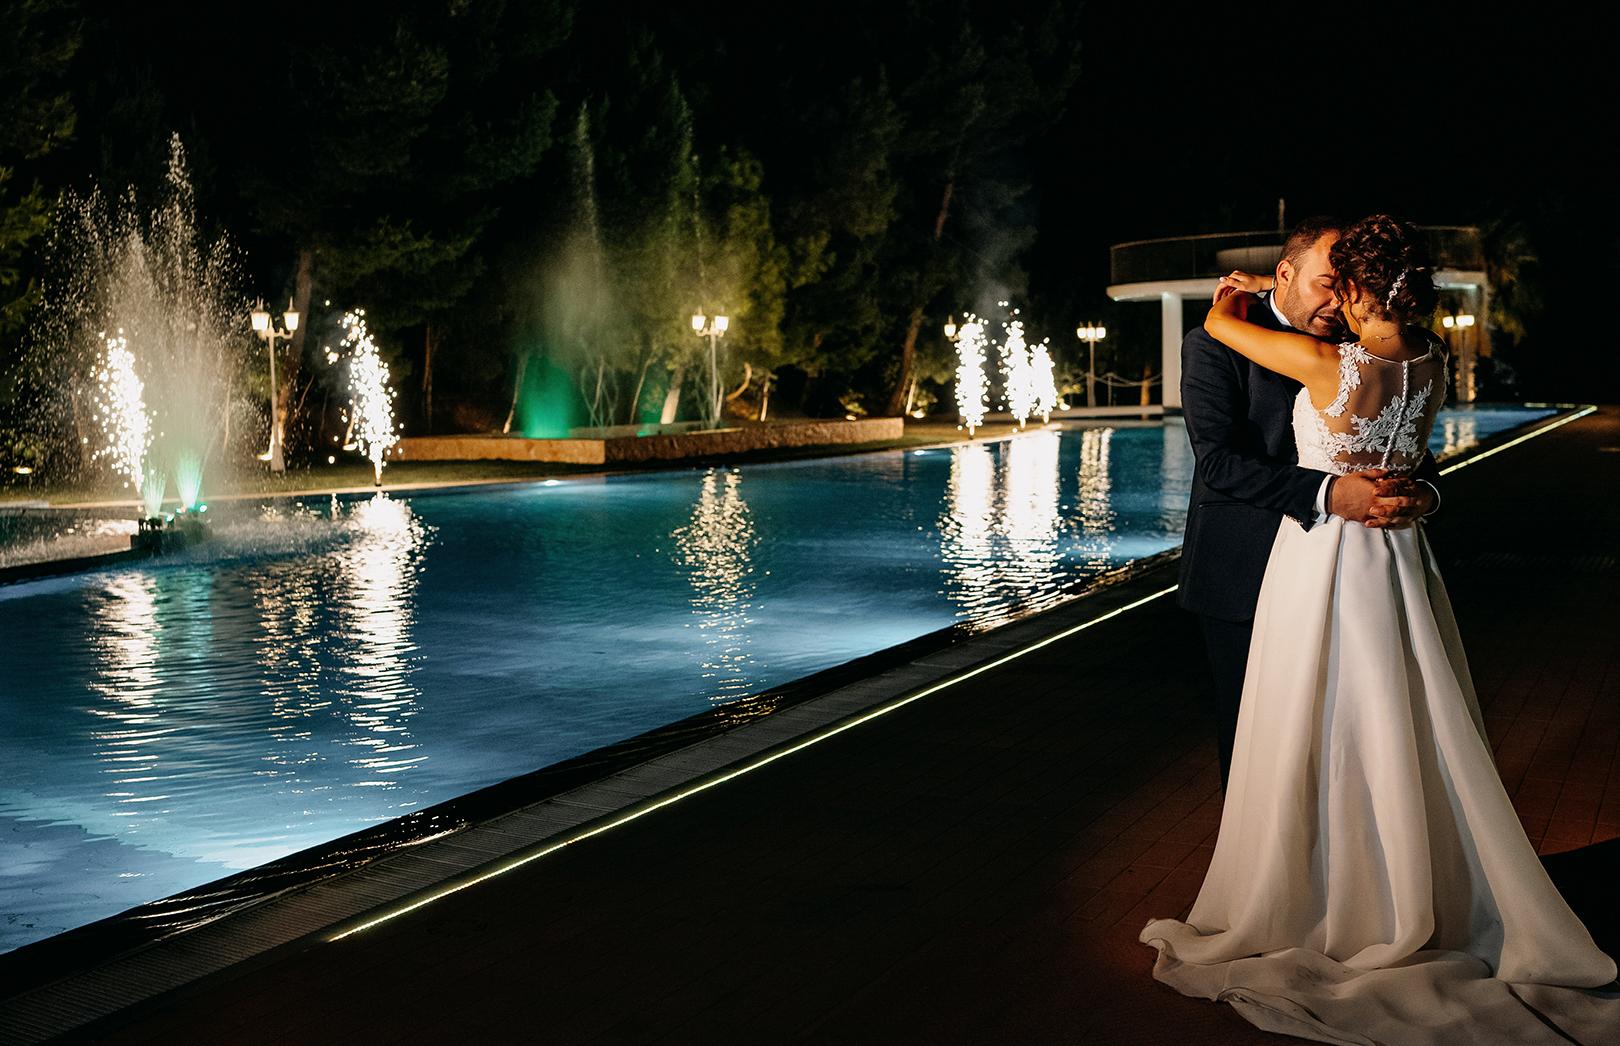 44 gianni-lepore-piscina-vigna-nocelli-lucera